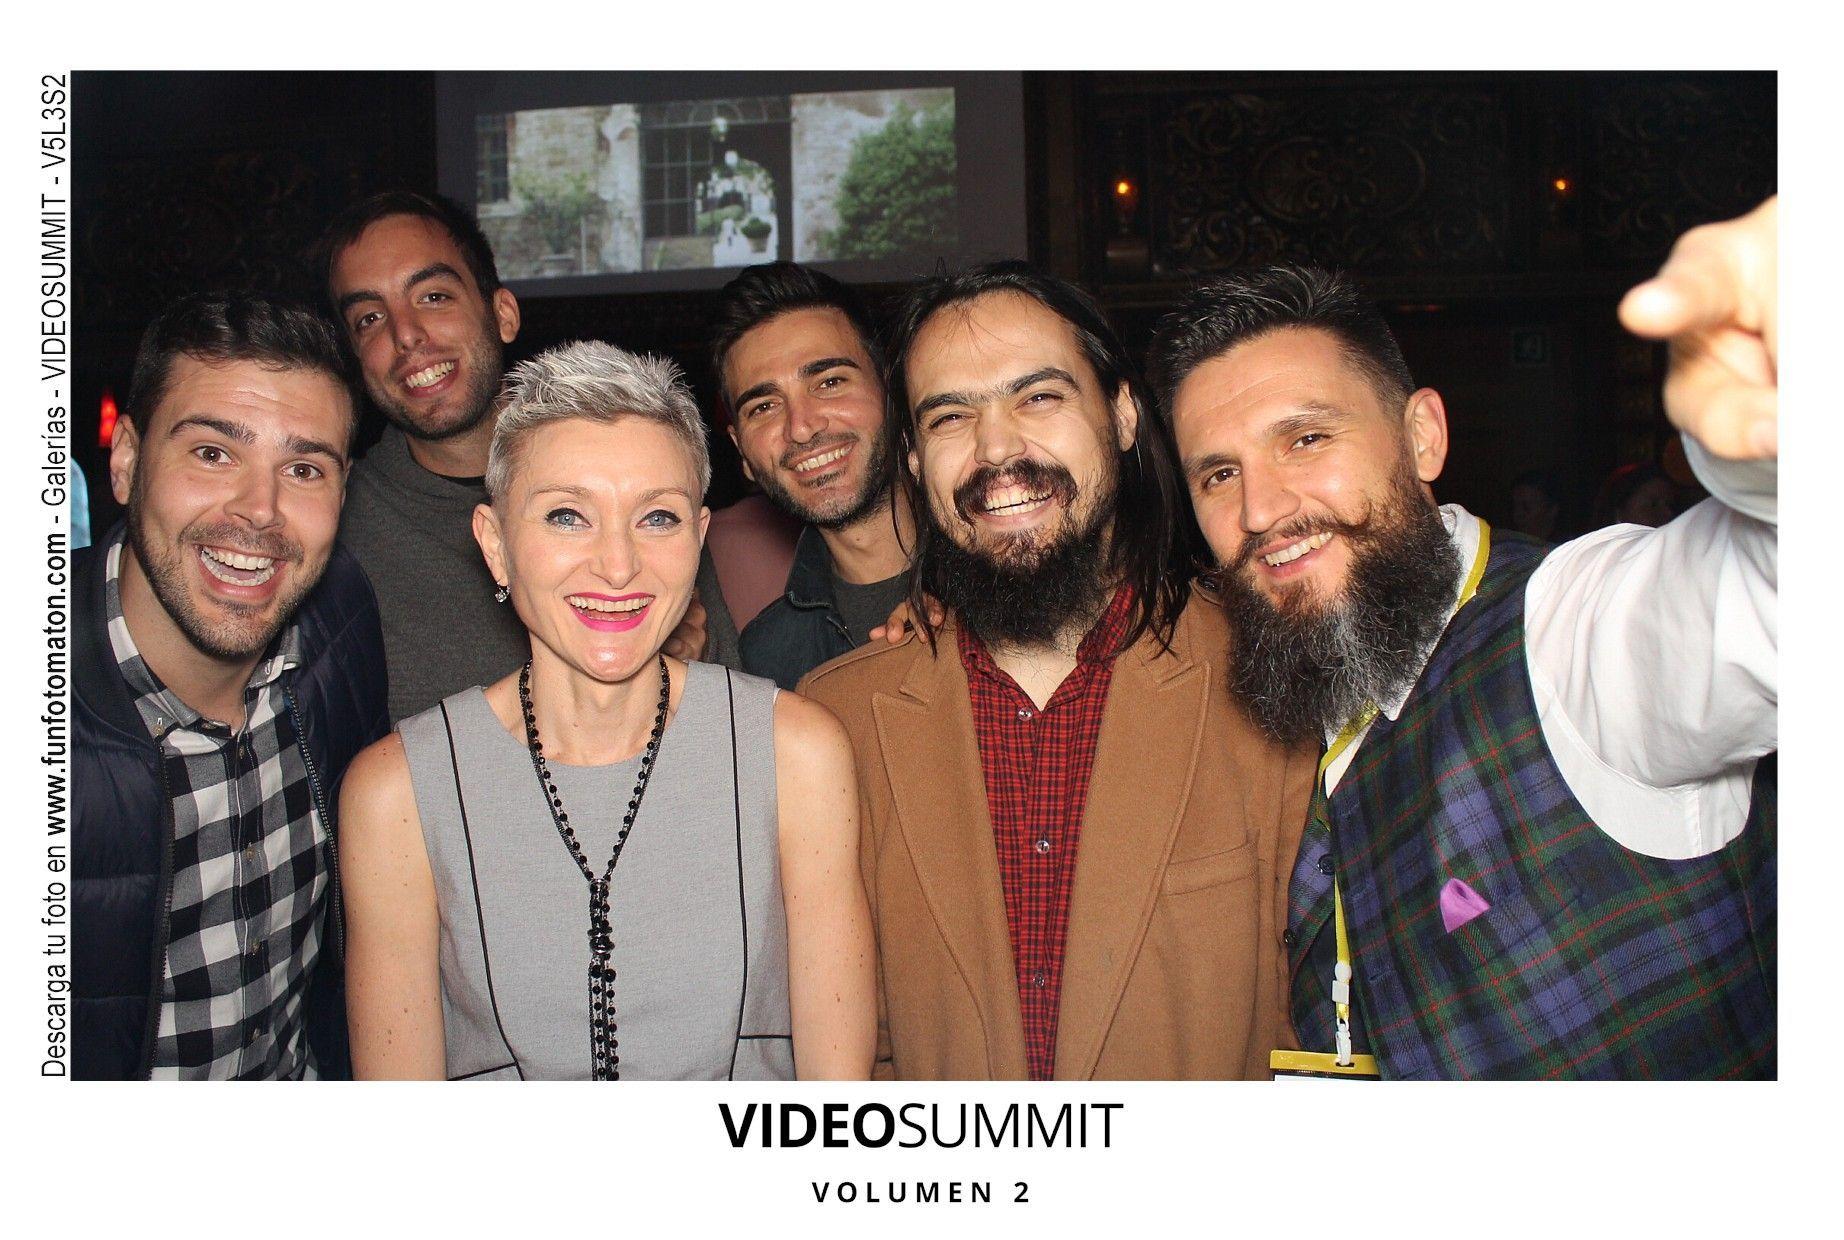 videosummit-vol2-club-party-002